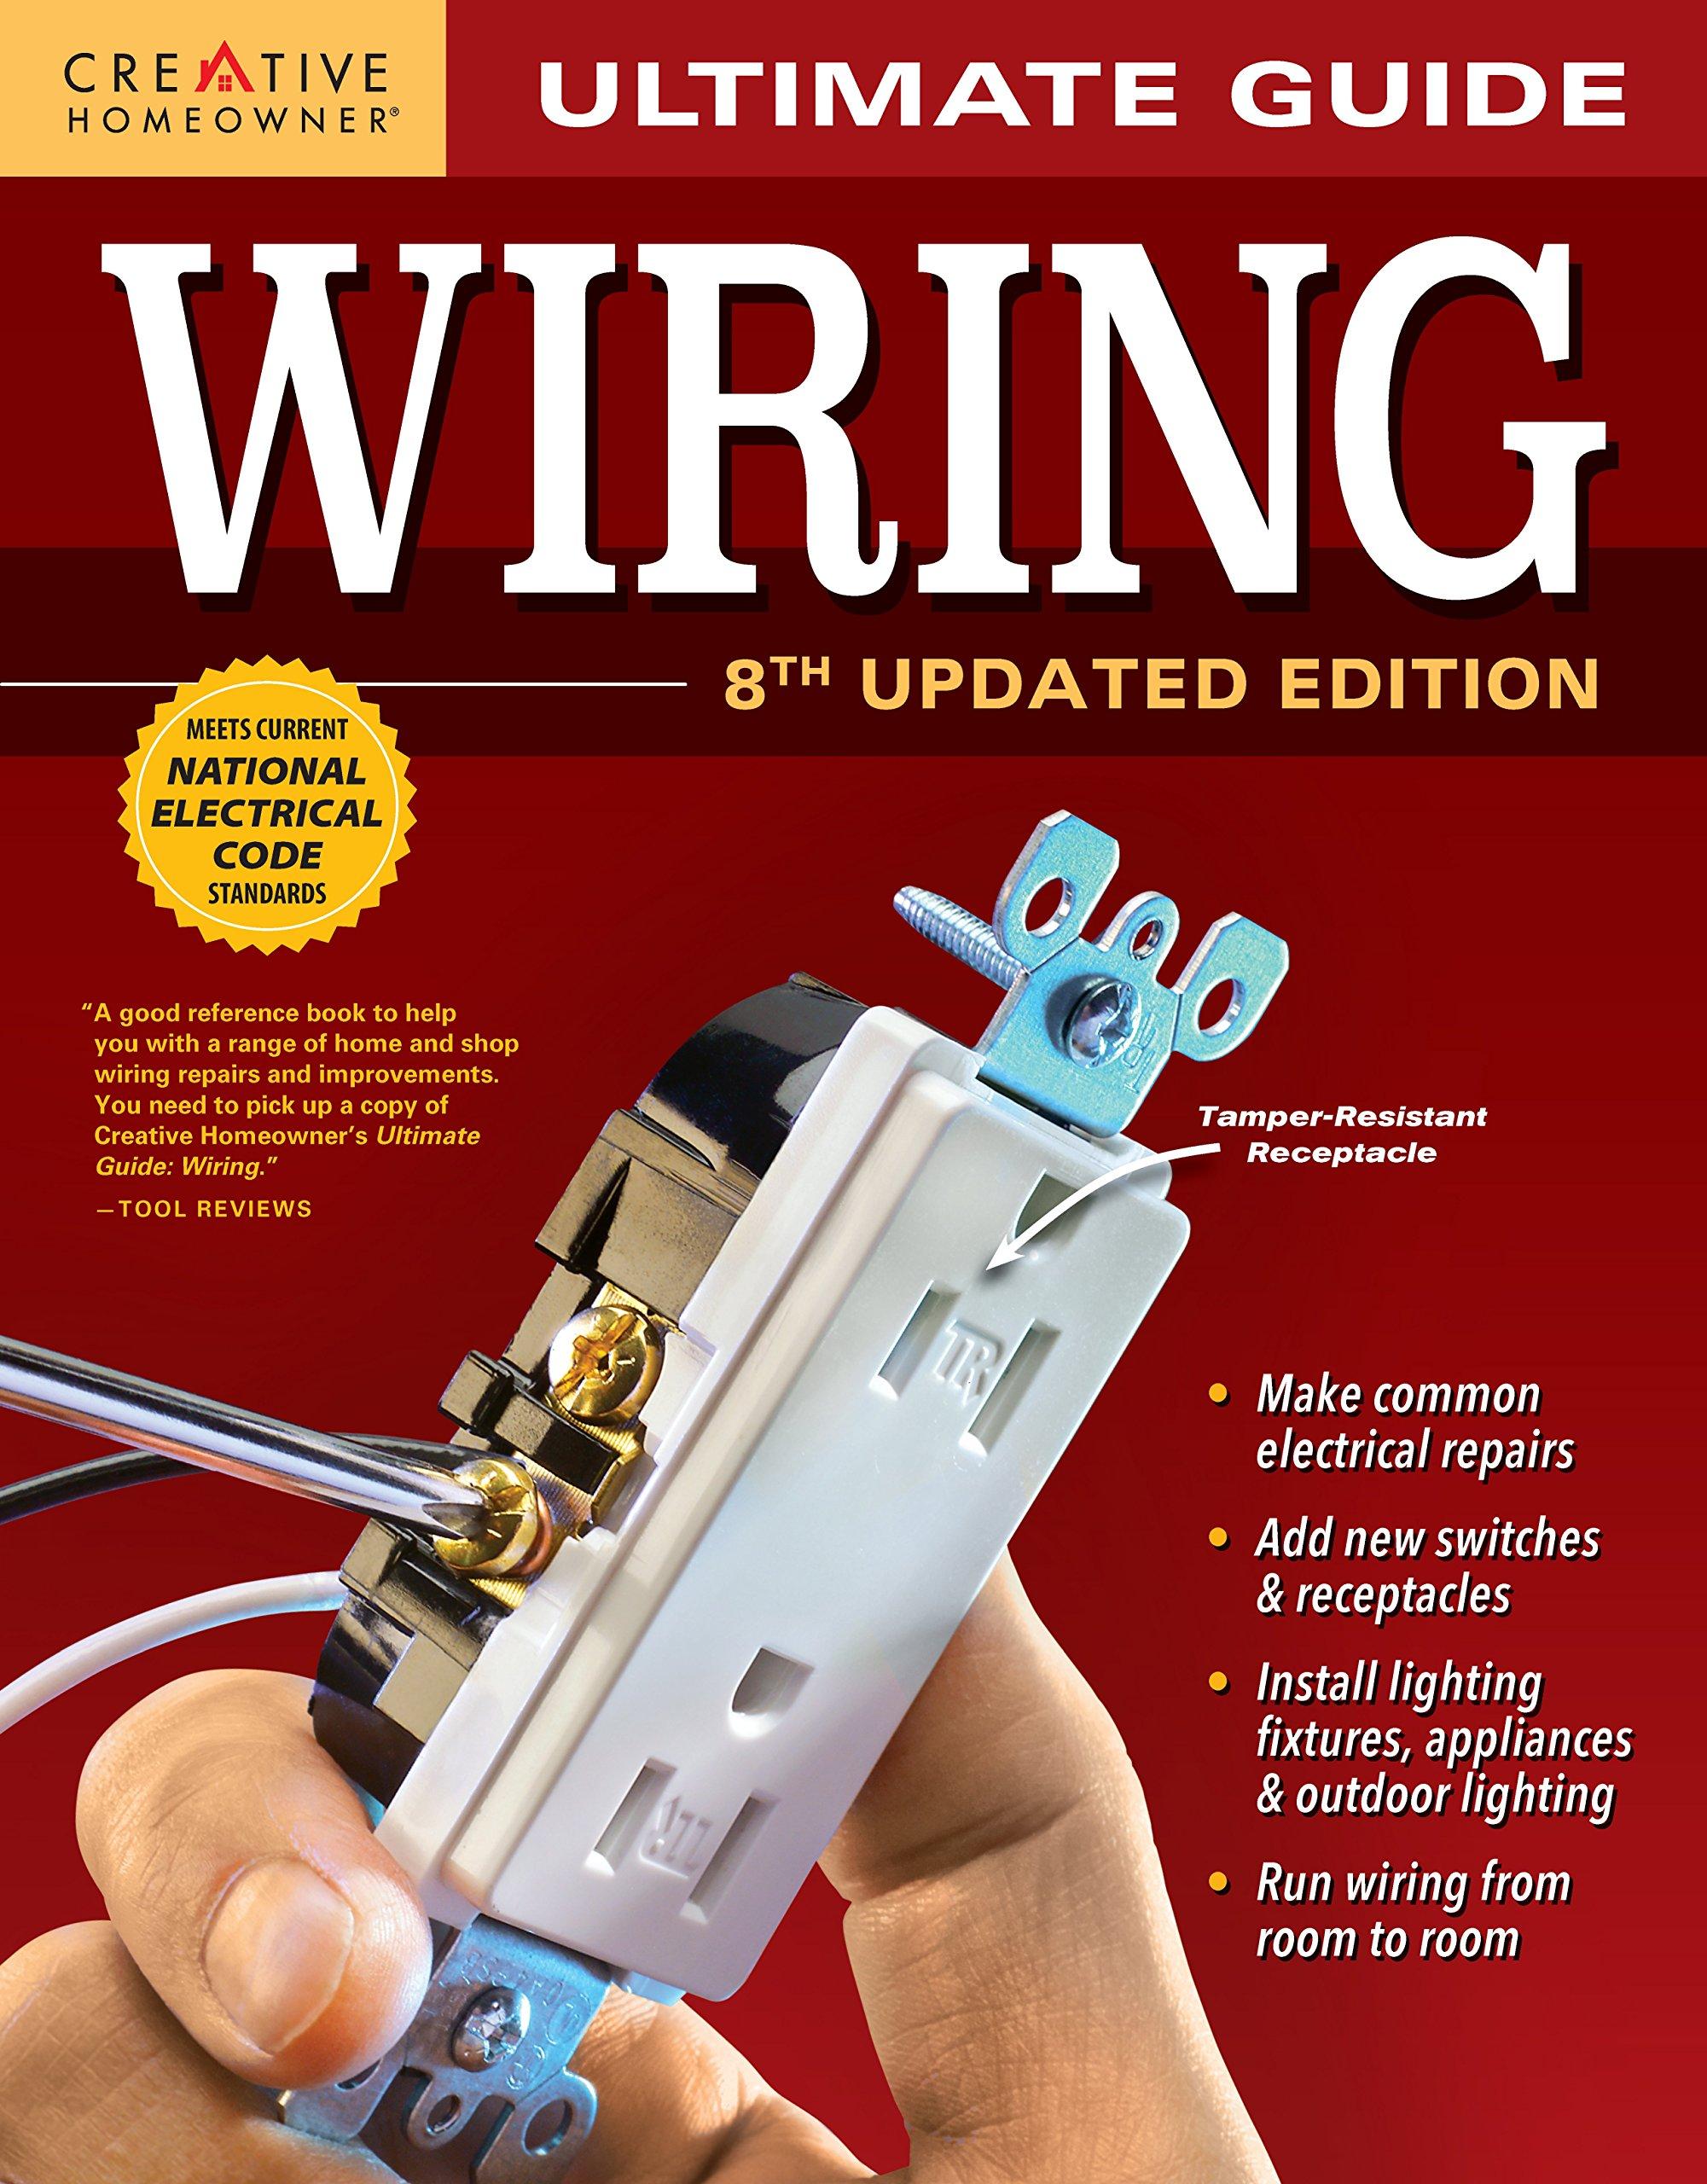 Miraculous Ultimate Guide Wiring 8Th Updated Edition Creative Homeowner Diy Wiring Cloud Rdonaheevemohammedshrineorg